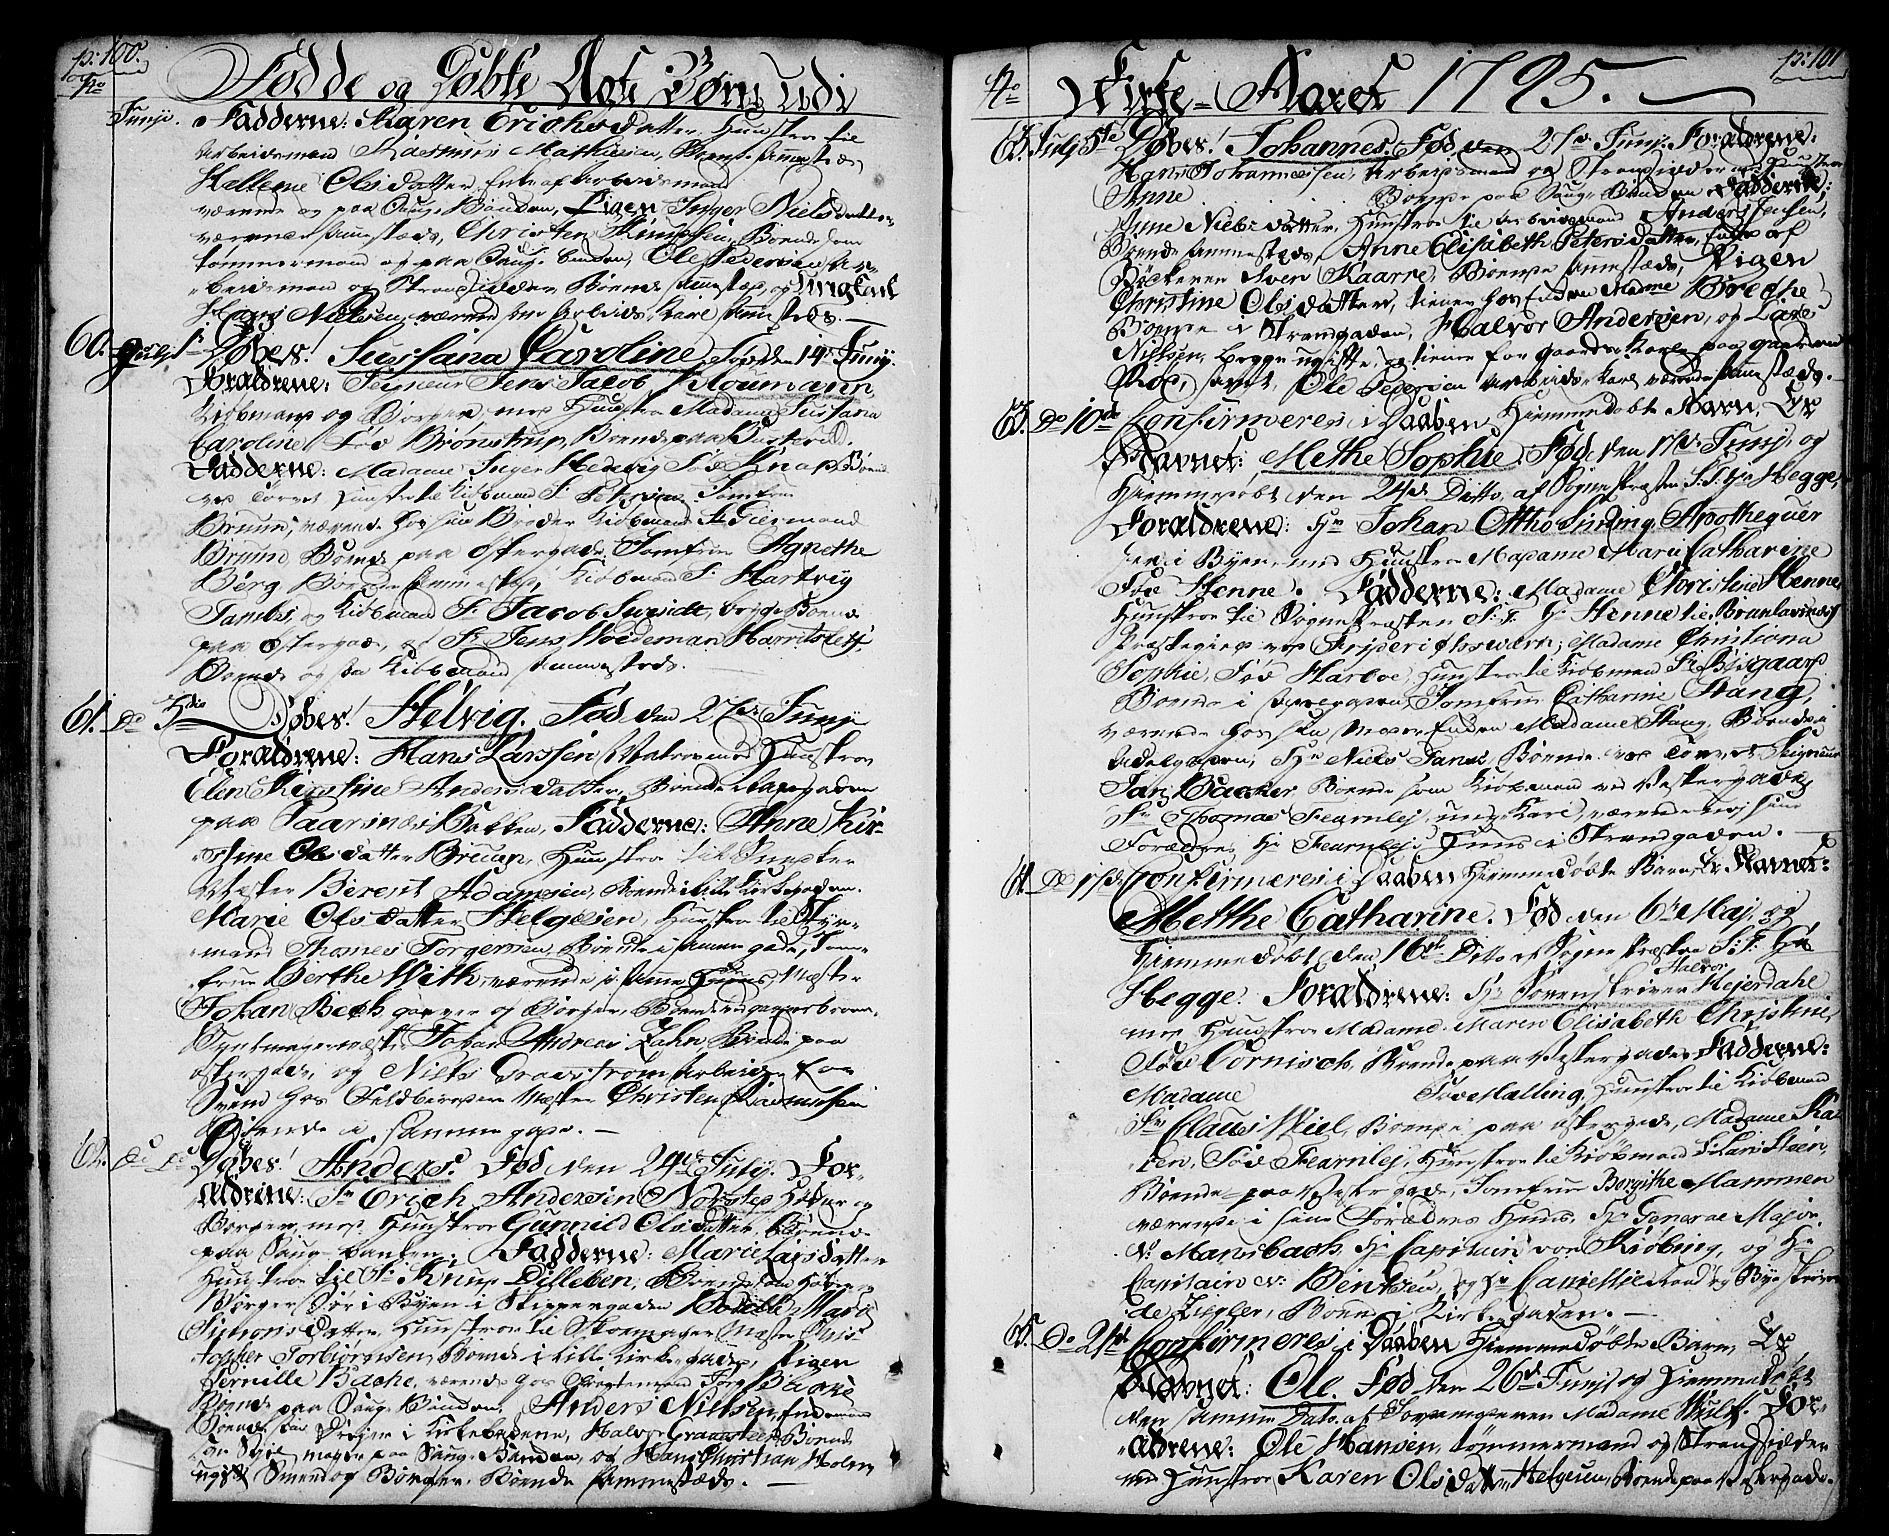 SAO, Halden prestekontor Kirkebøker, F/Fa/L0002: Parish register (official) no. I 2, 1792-1812, p. 100-101